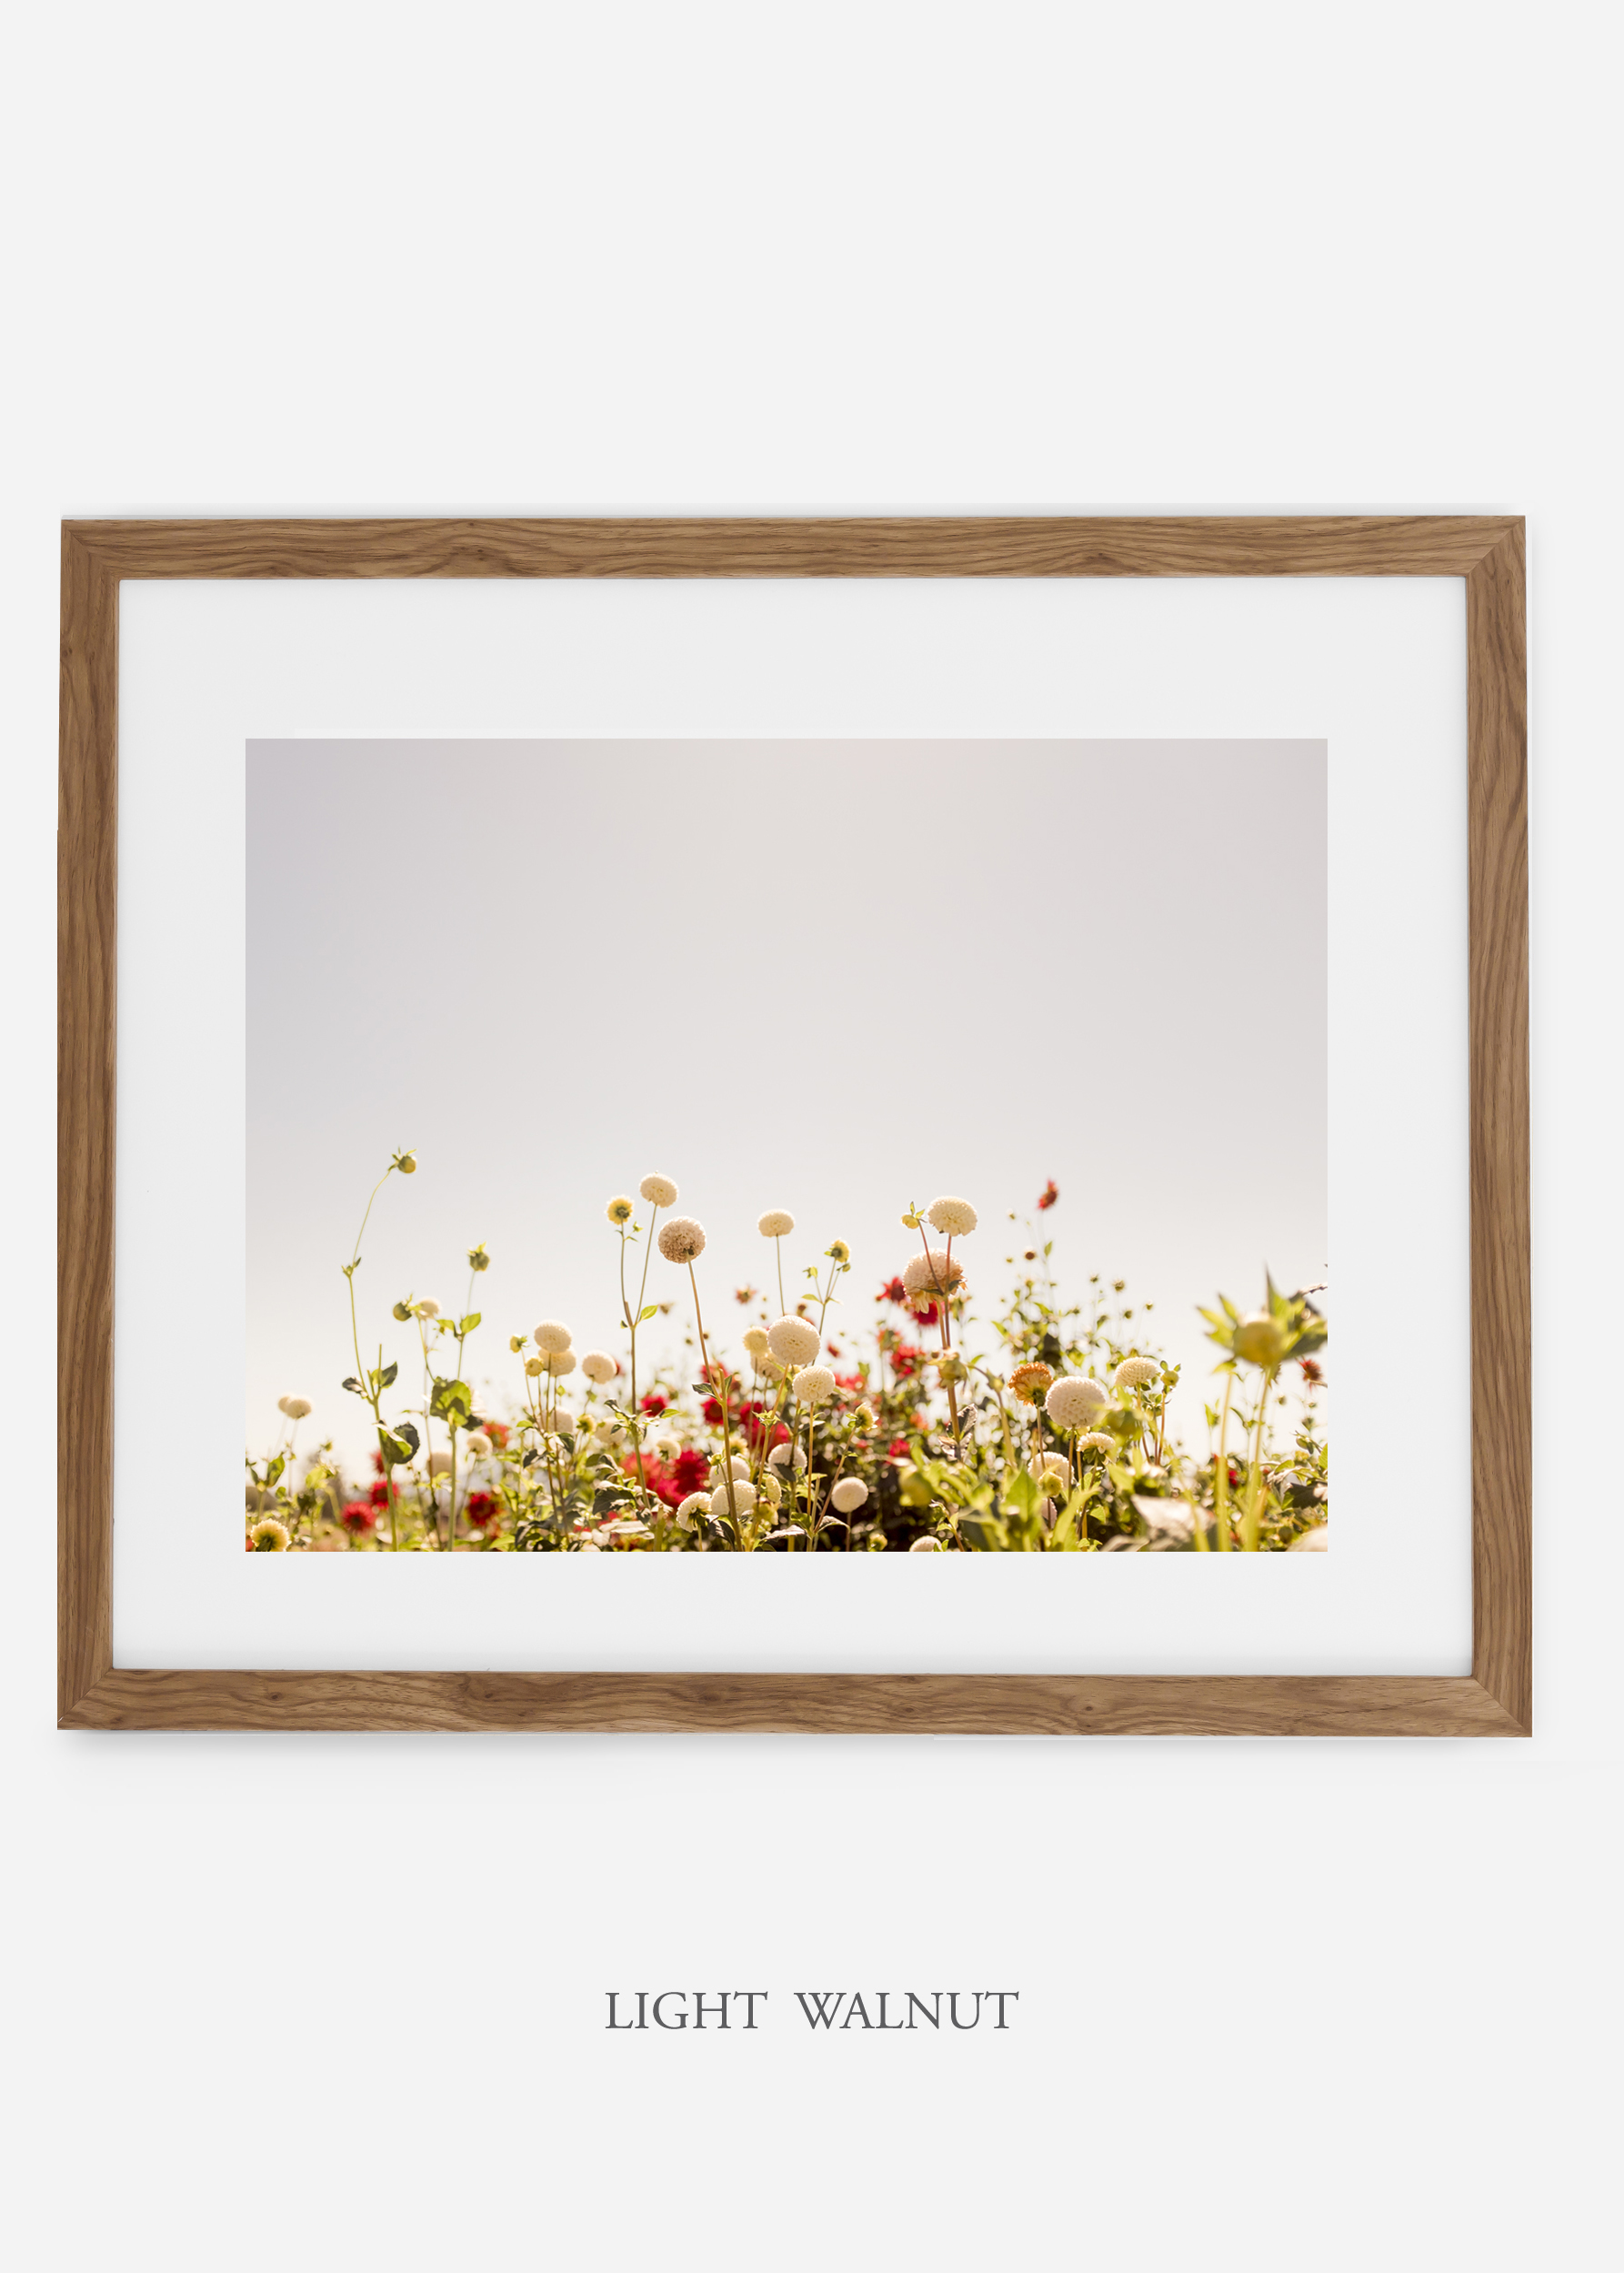 wilder-california-lightwalnutframe-dahlia-5-minimal-botanical-print-art-interior-design.jpg